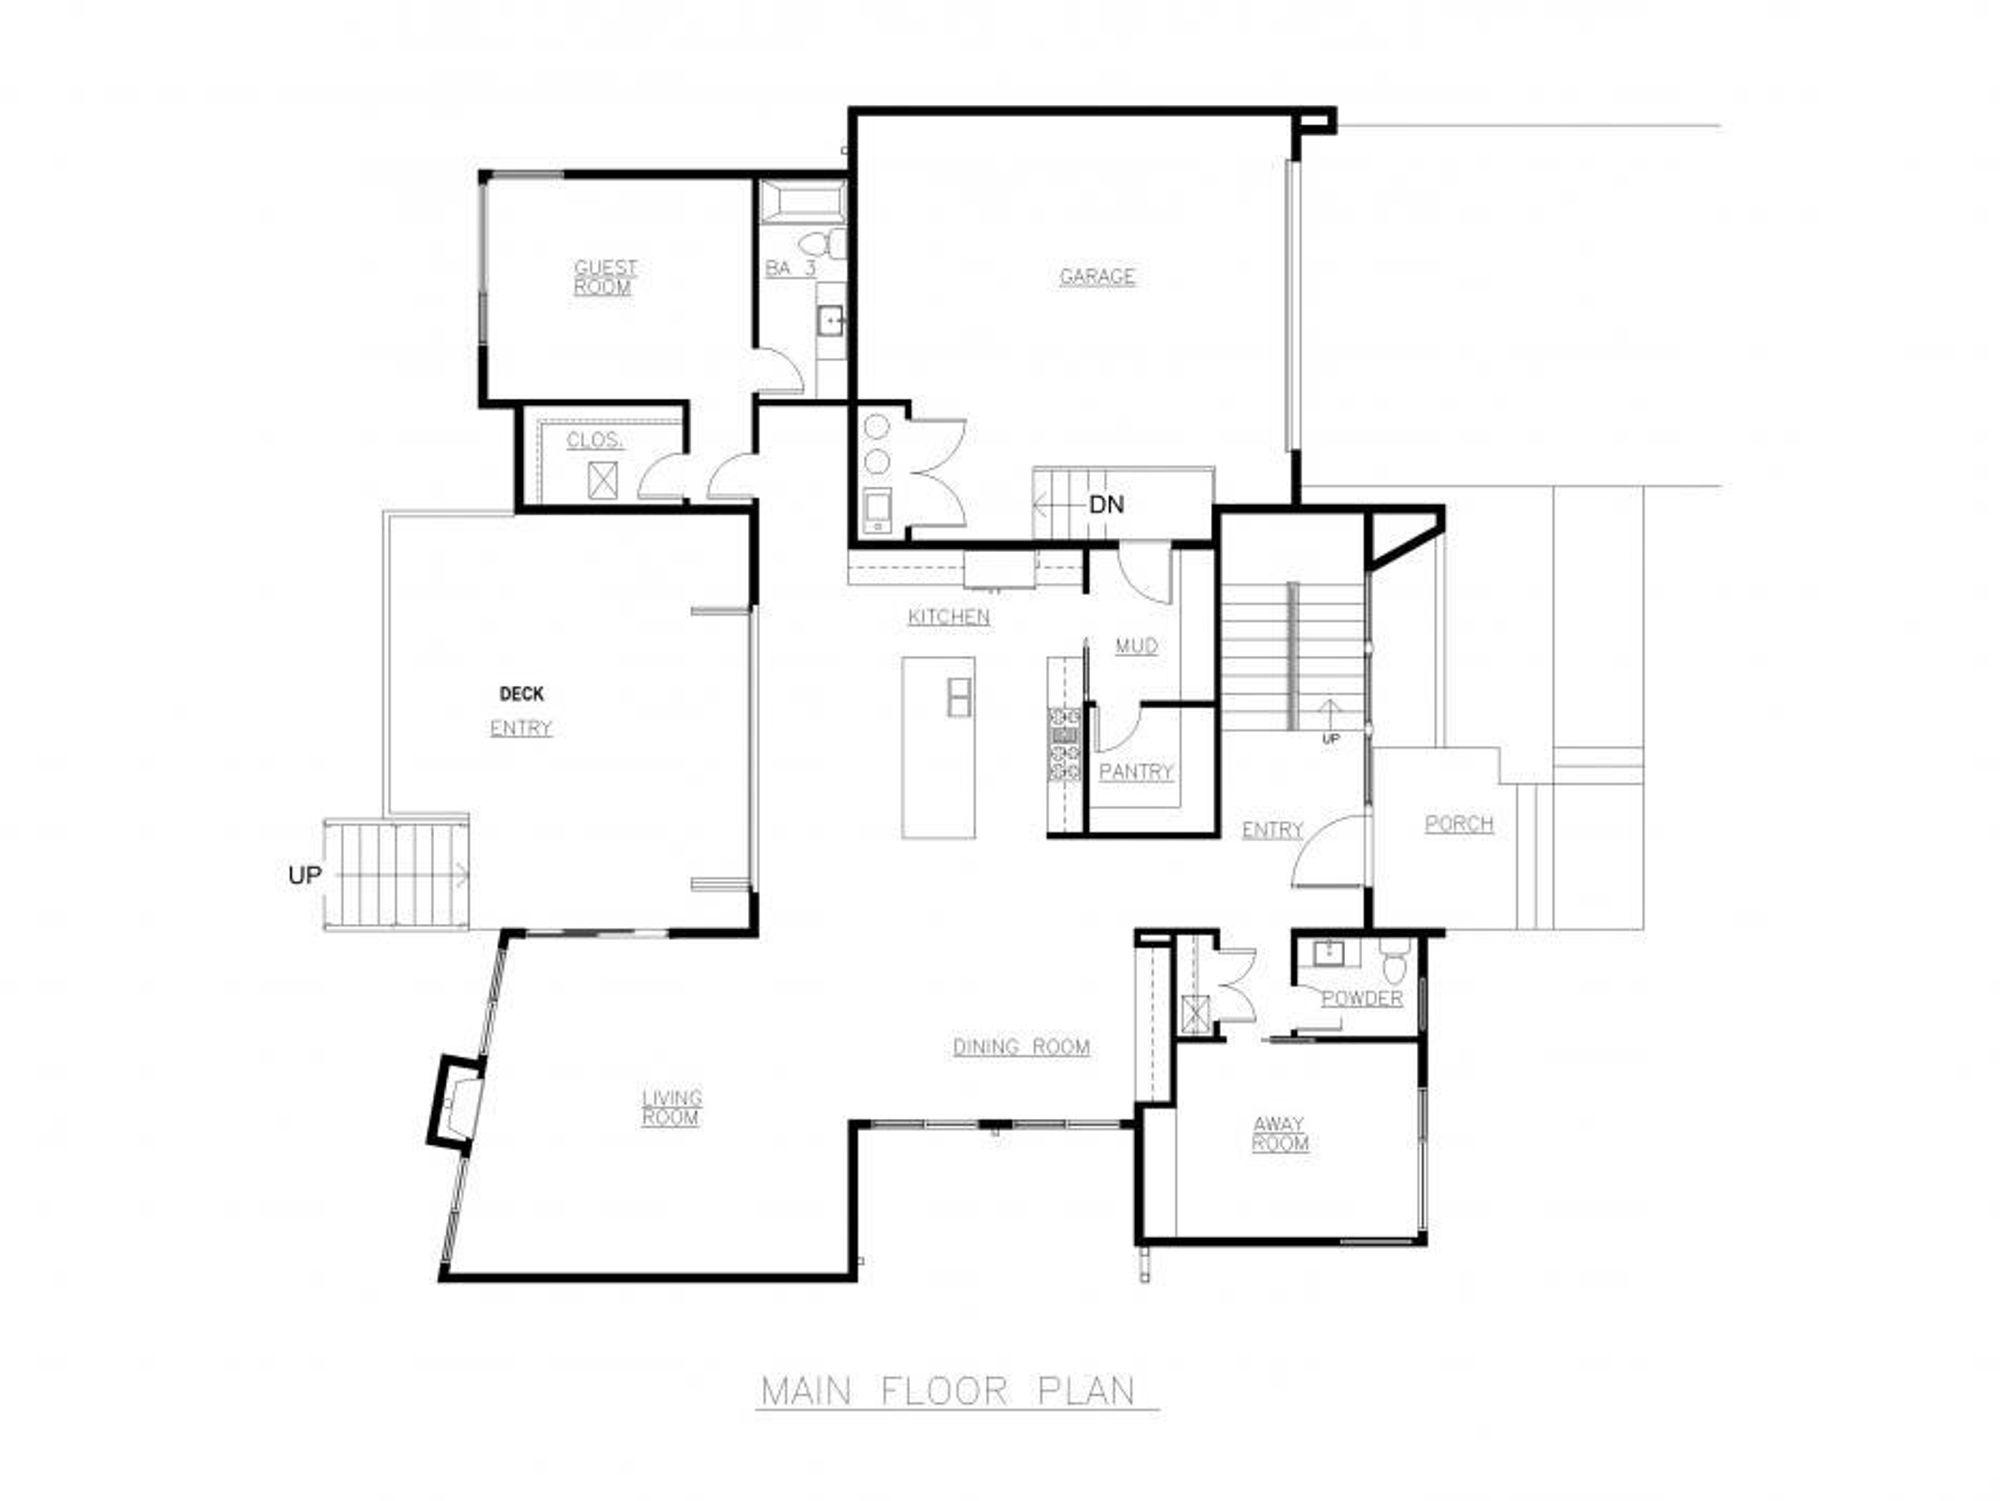 Oslo Main Floor Plan